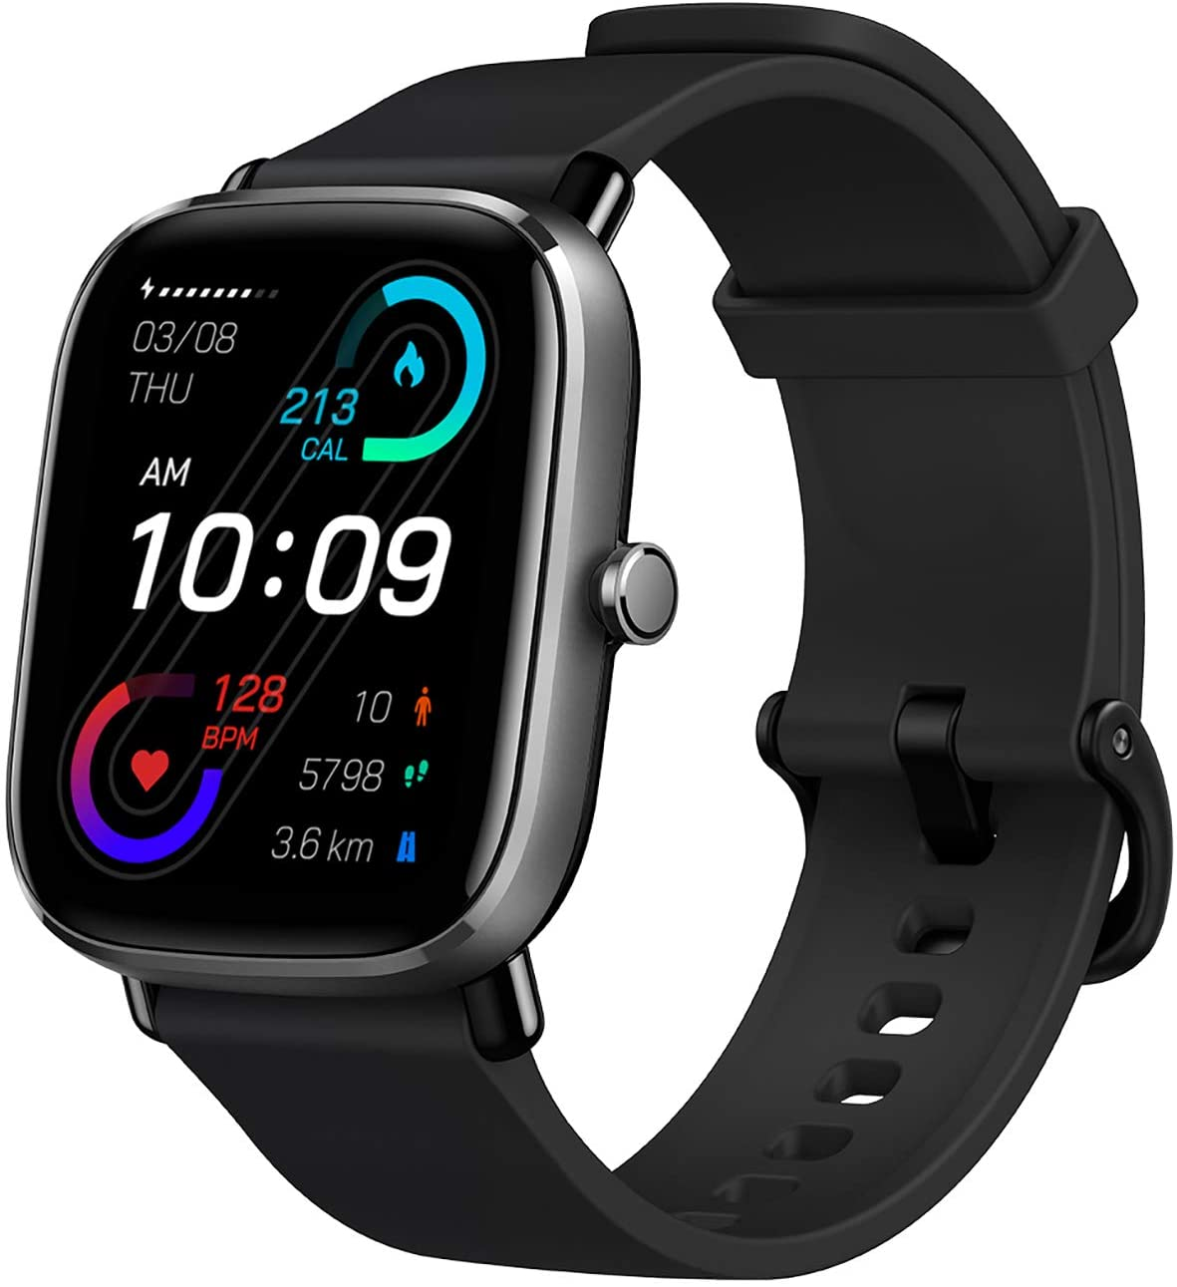 Smartwatch Amazfit GTS 2 por 74,90€ ¡¡Ahorras 33€!!